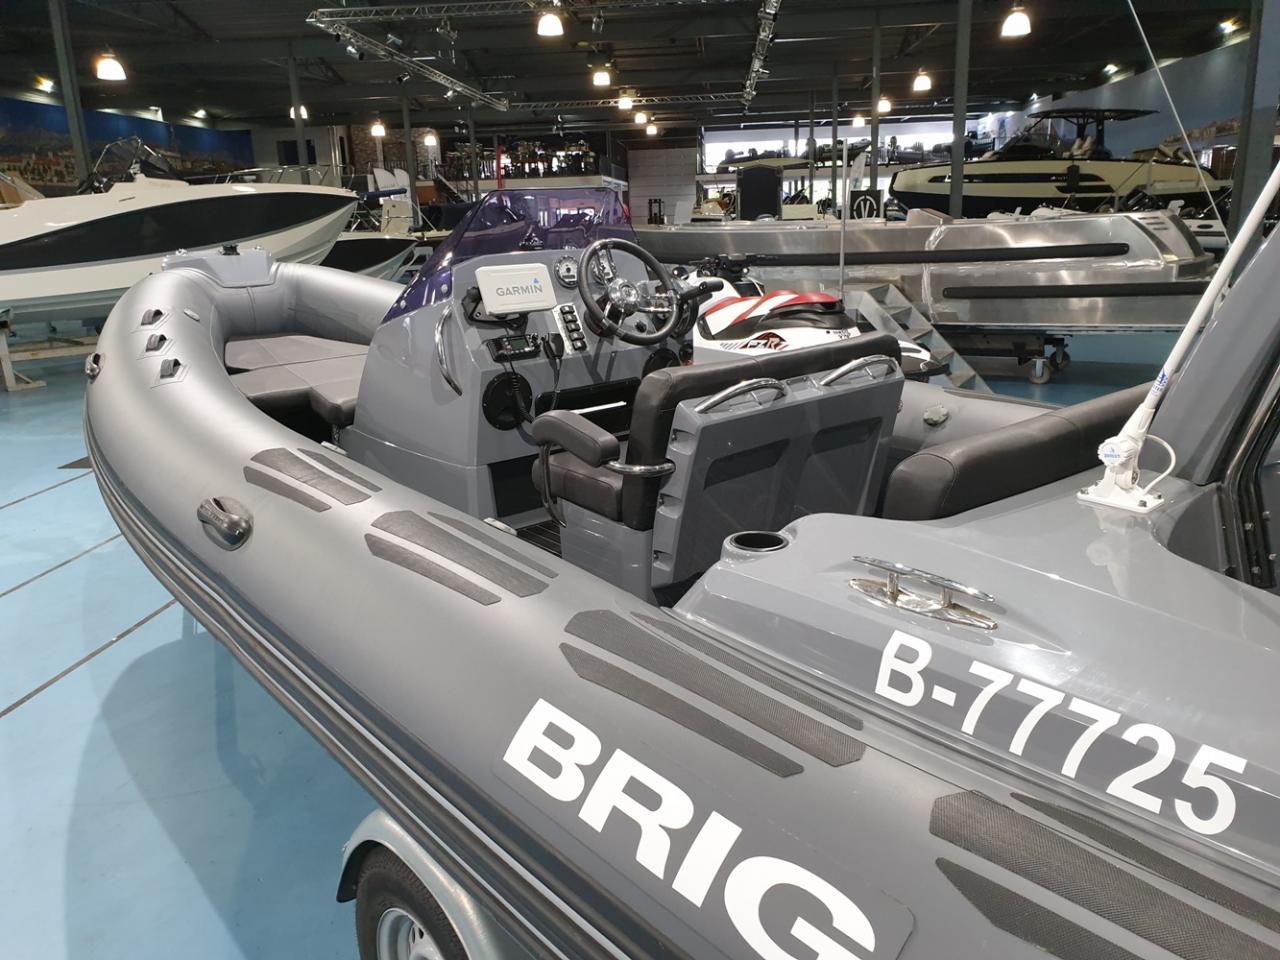 Brig Eagle 580 met Mercury 115 pk PRO XS  5